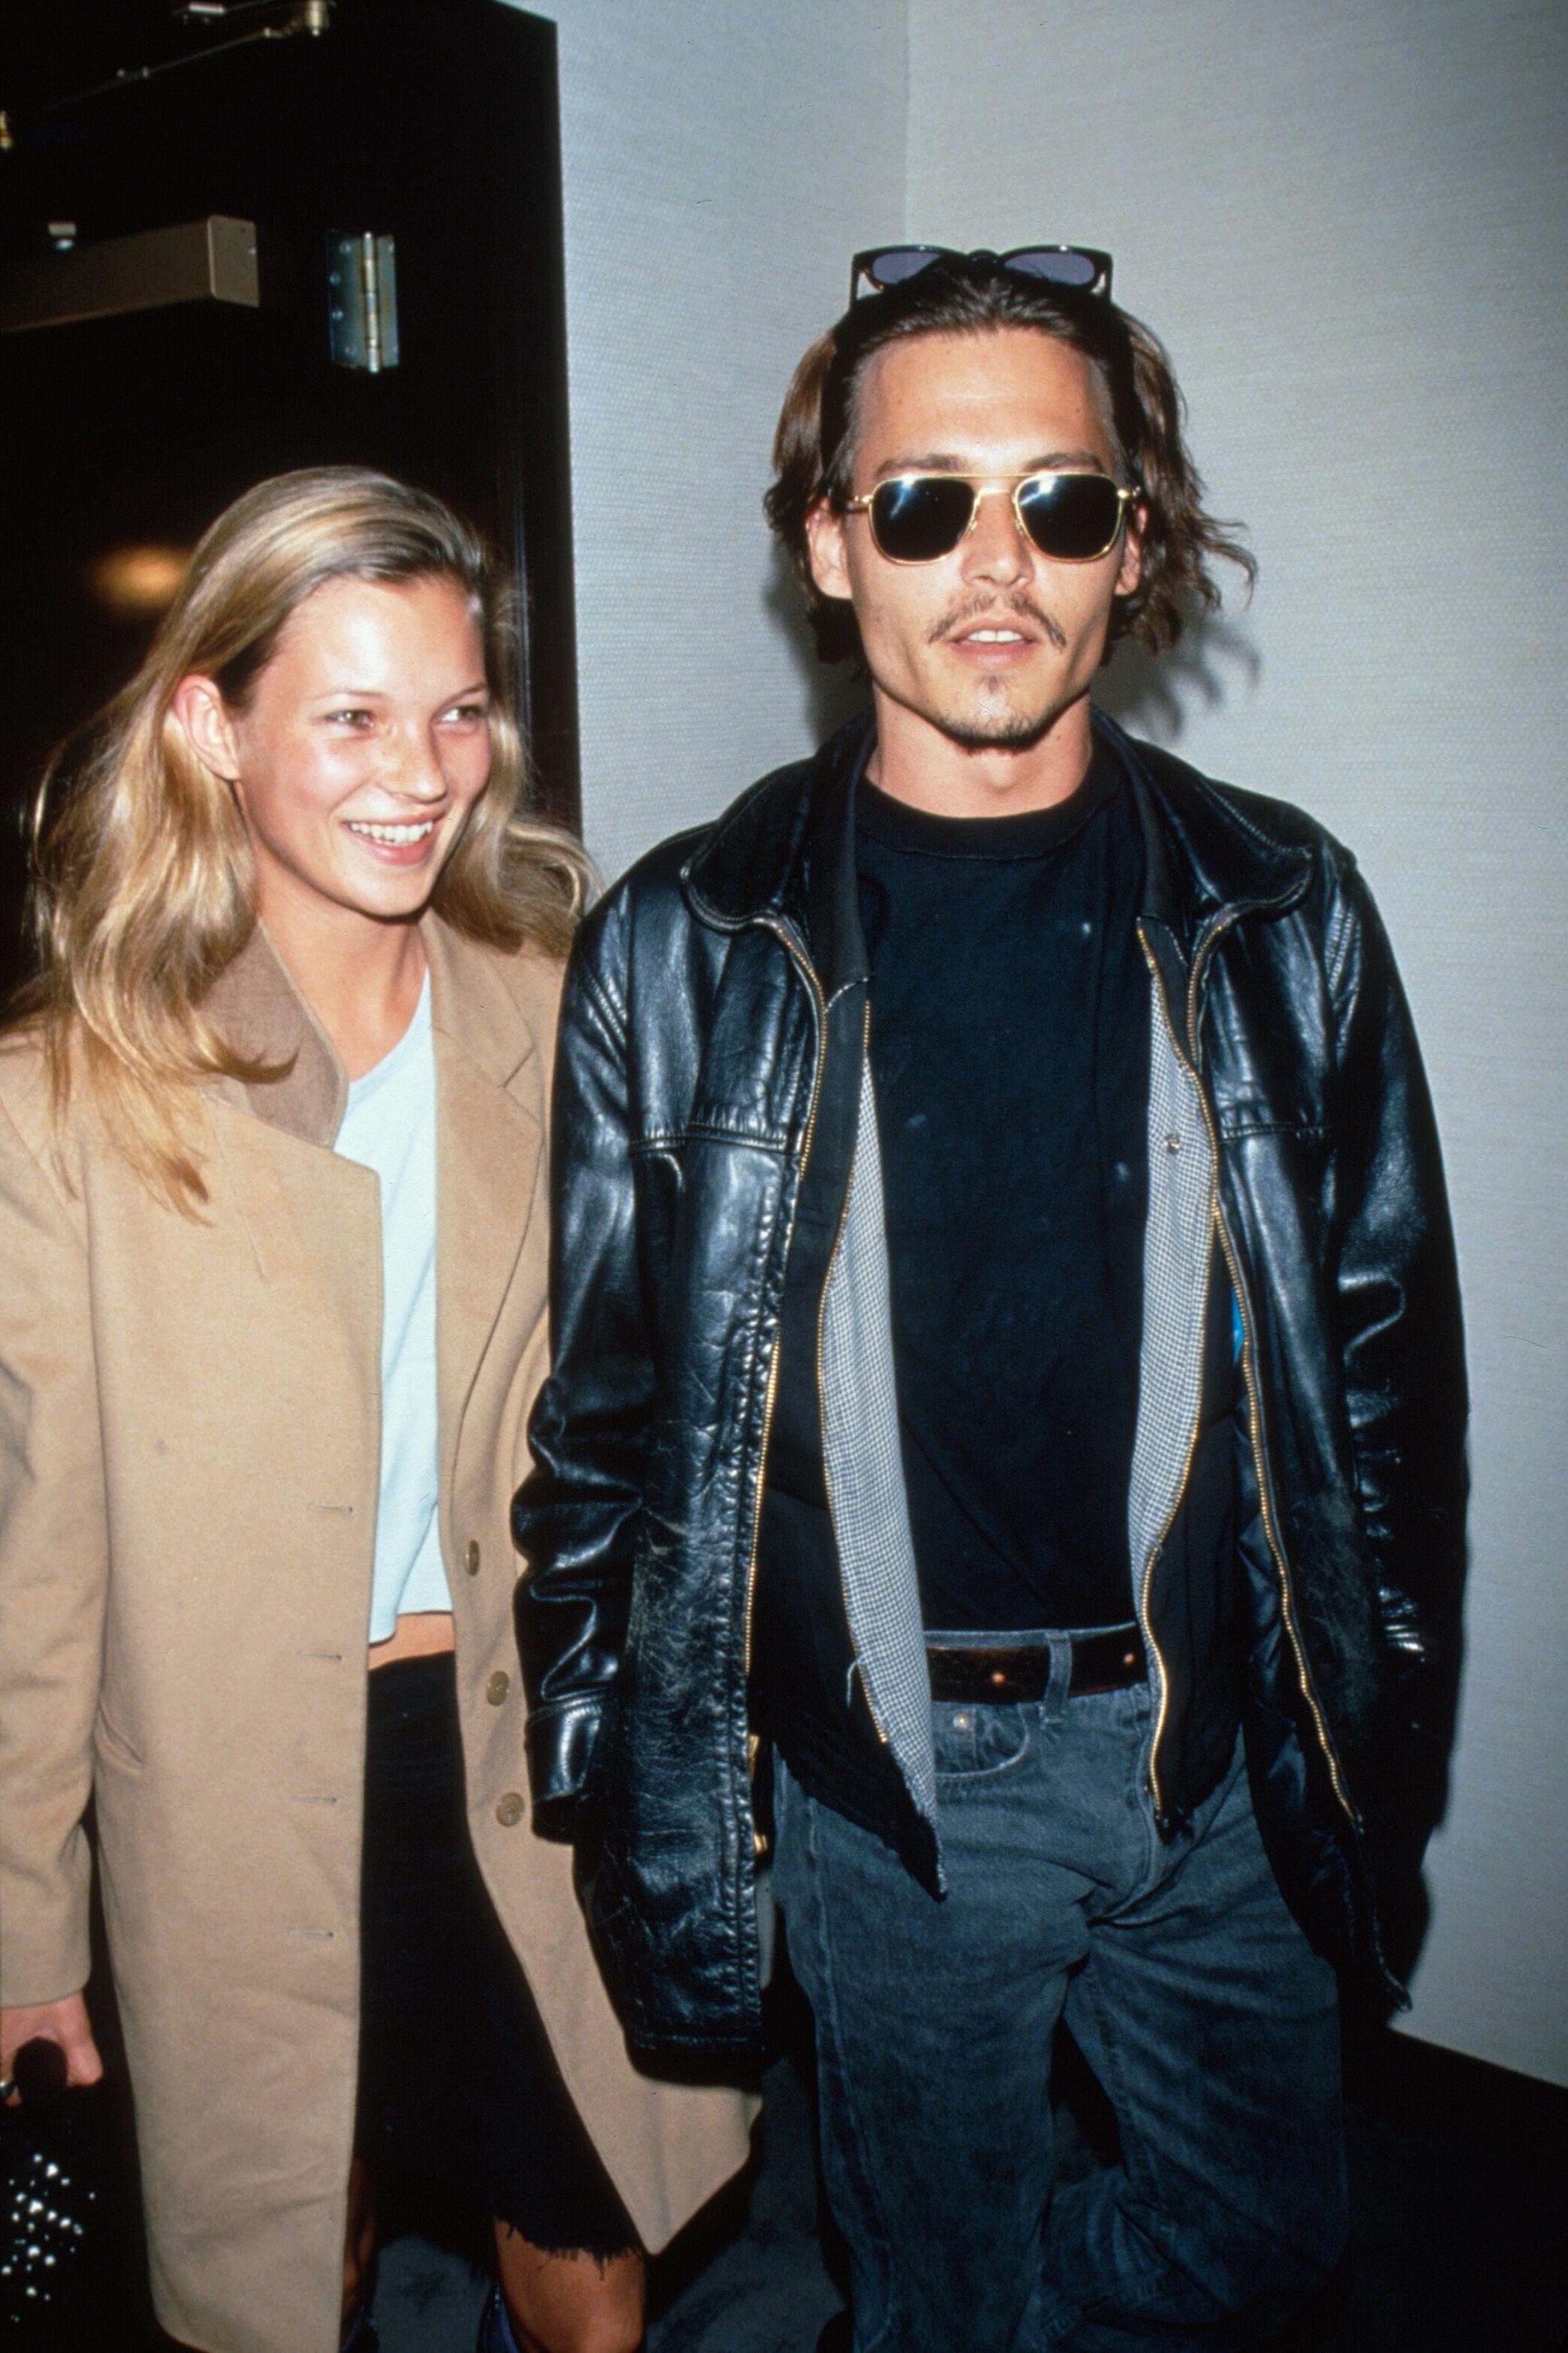 90s Fashion Eyewear Trends Kurt Cobain, Johnny Depp, Drew